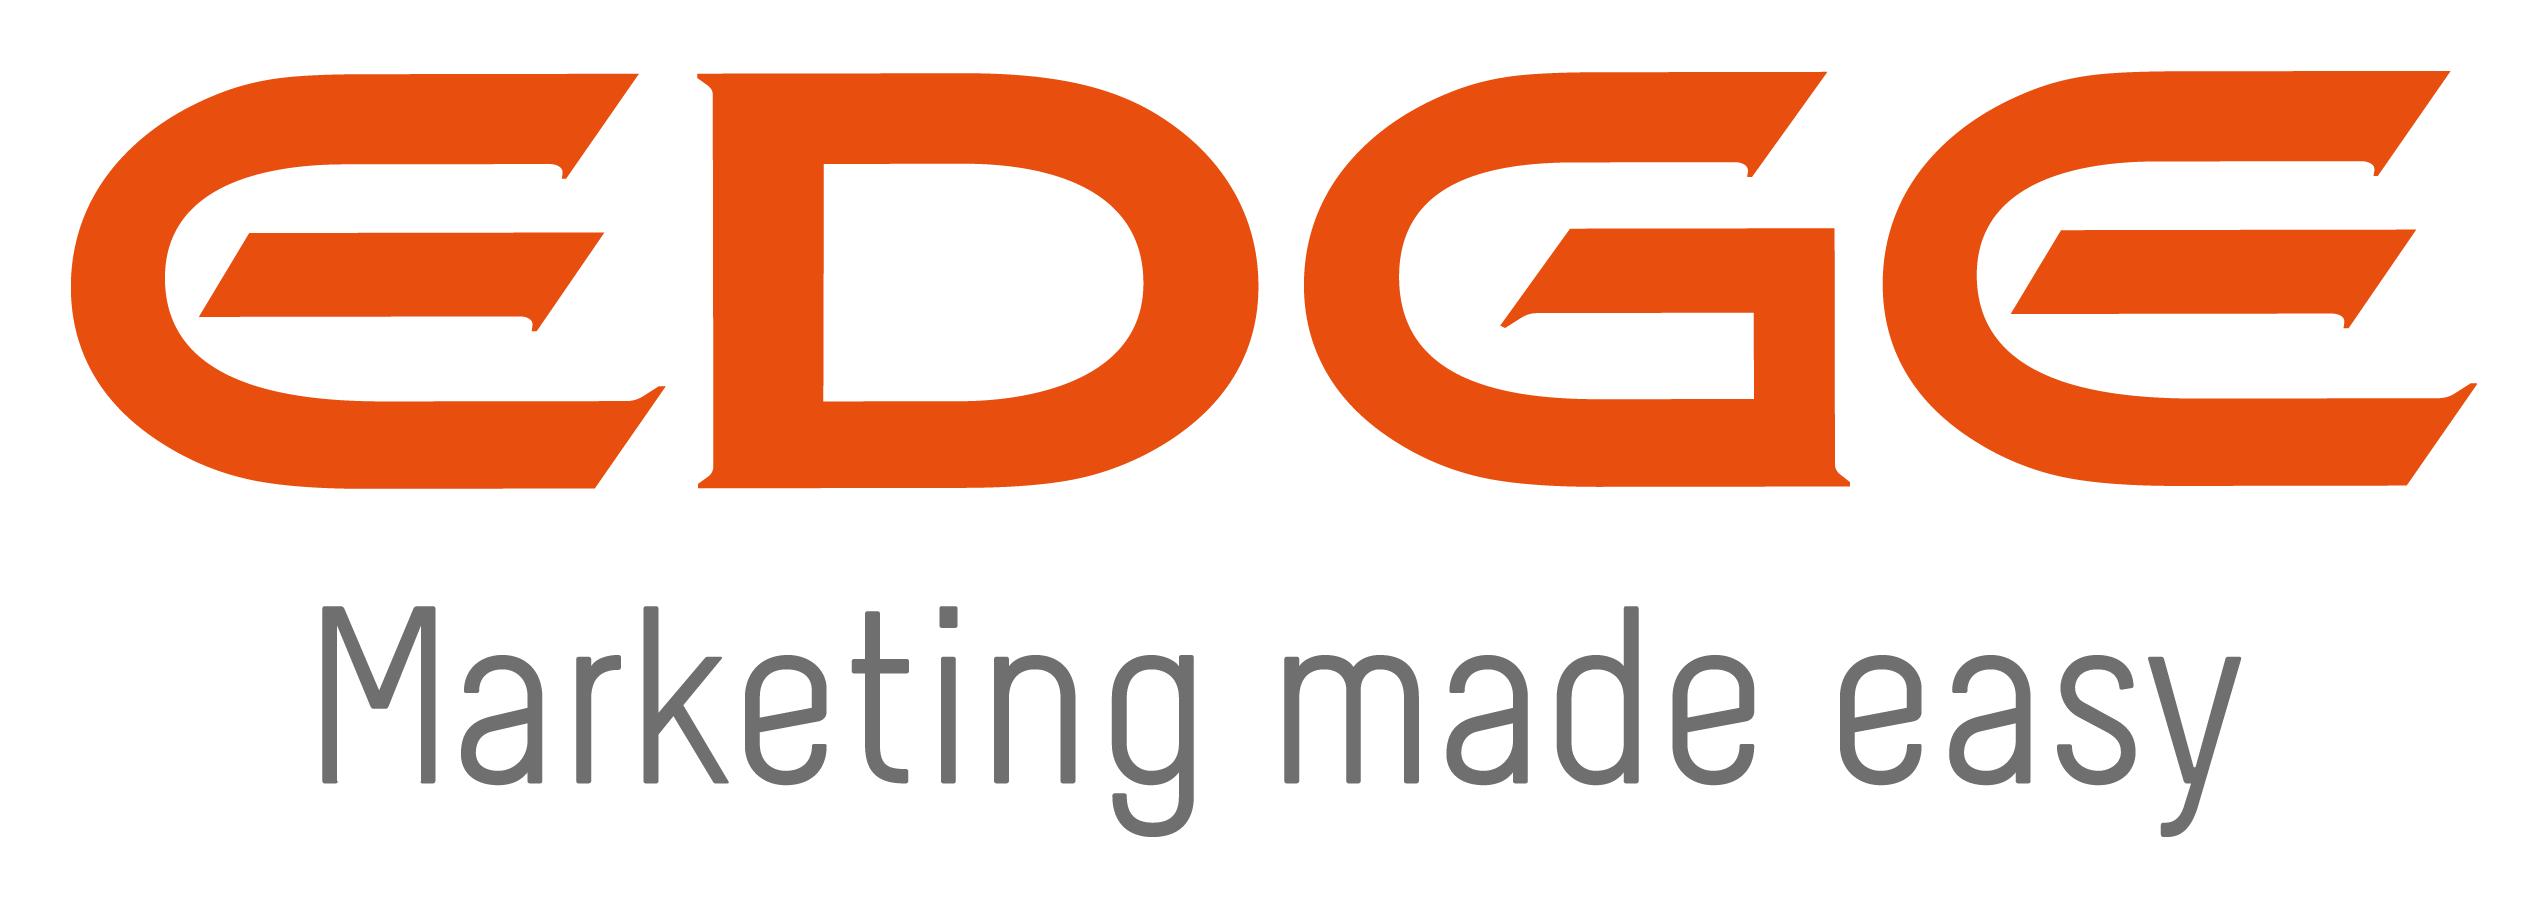 Digital Agency - Online Marketing Company Australia | Edge Marketing